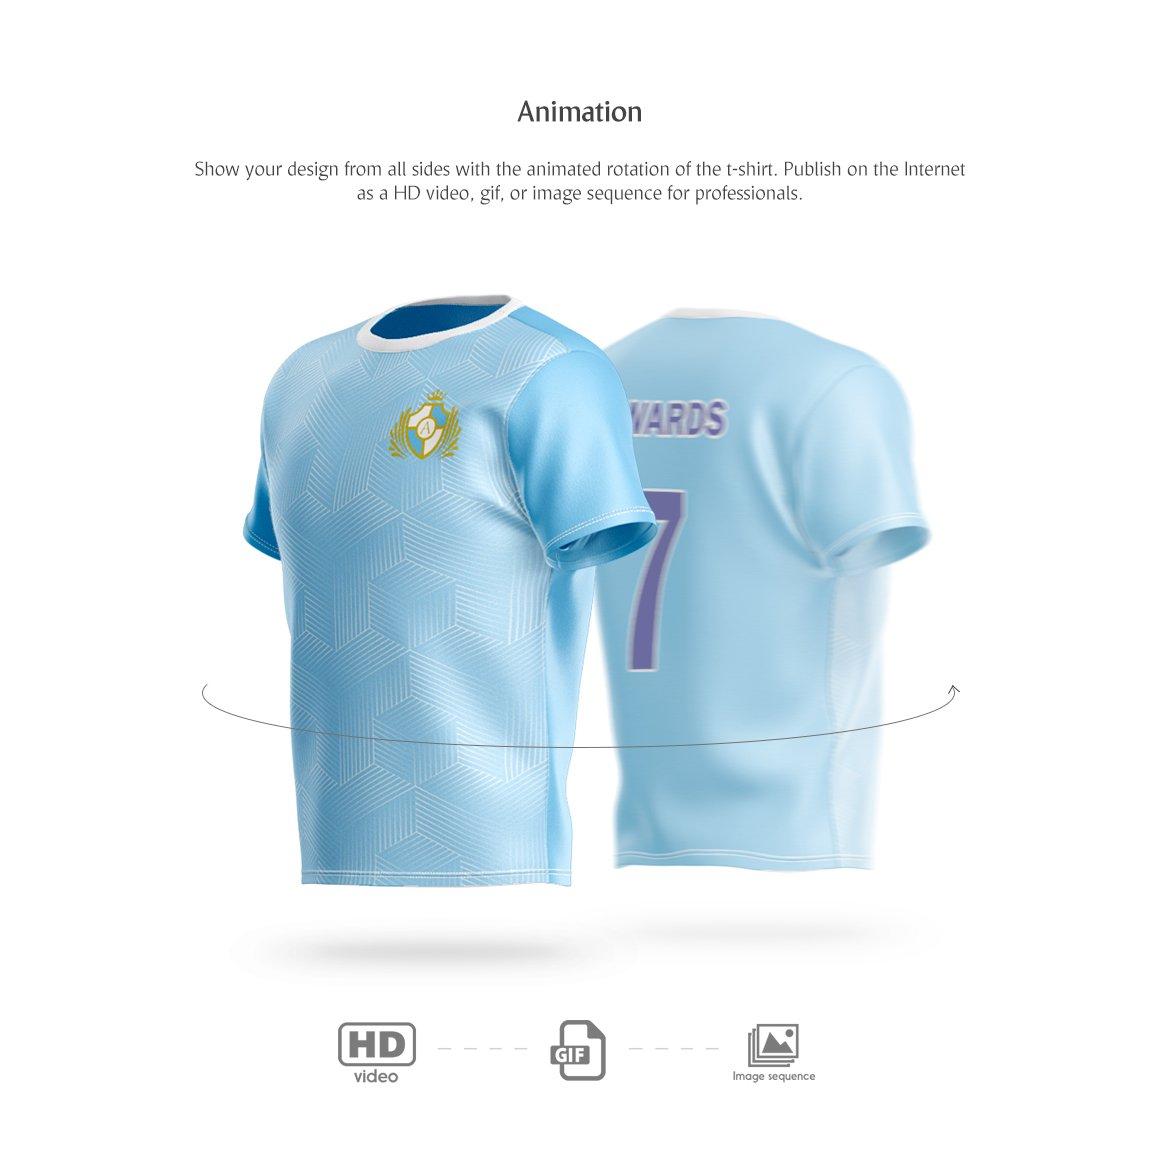 T恤设计360°旋转效果图样机模板 T-Shirt Animated Mockup插图(2)